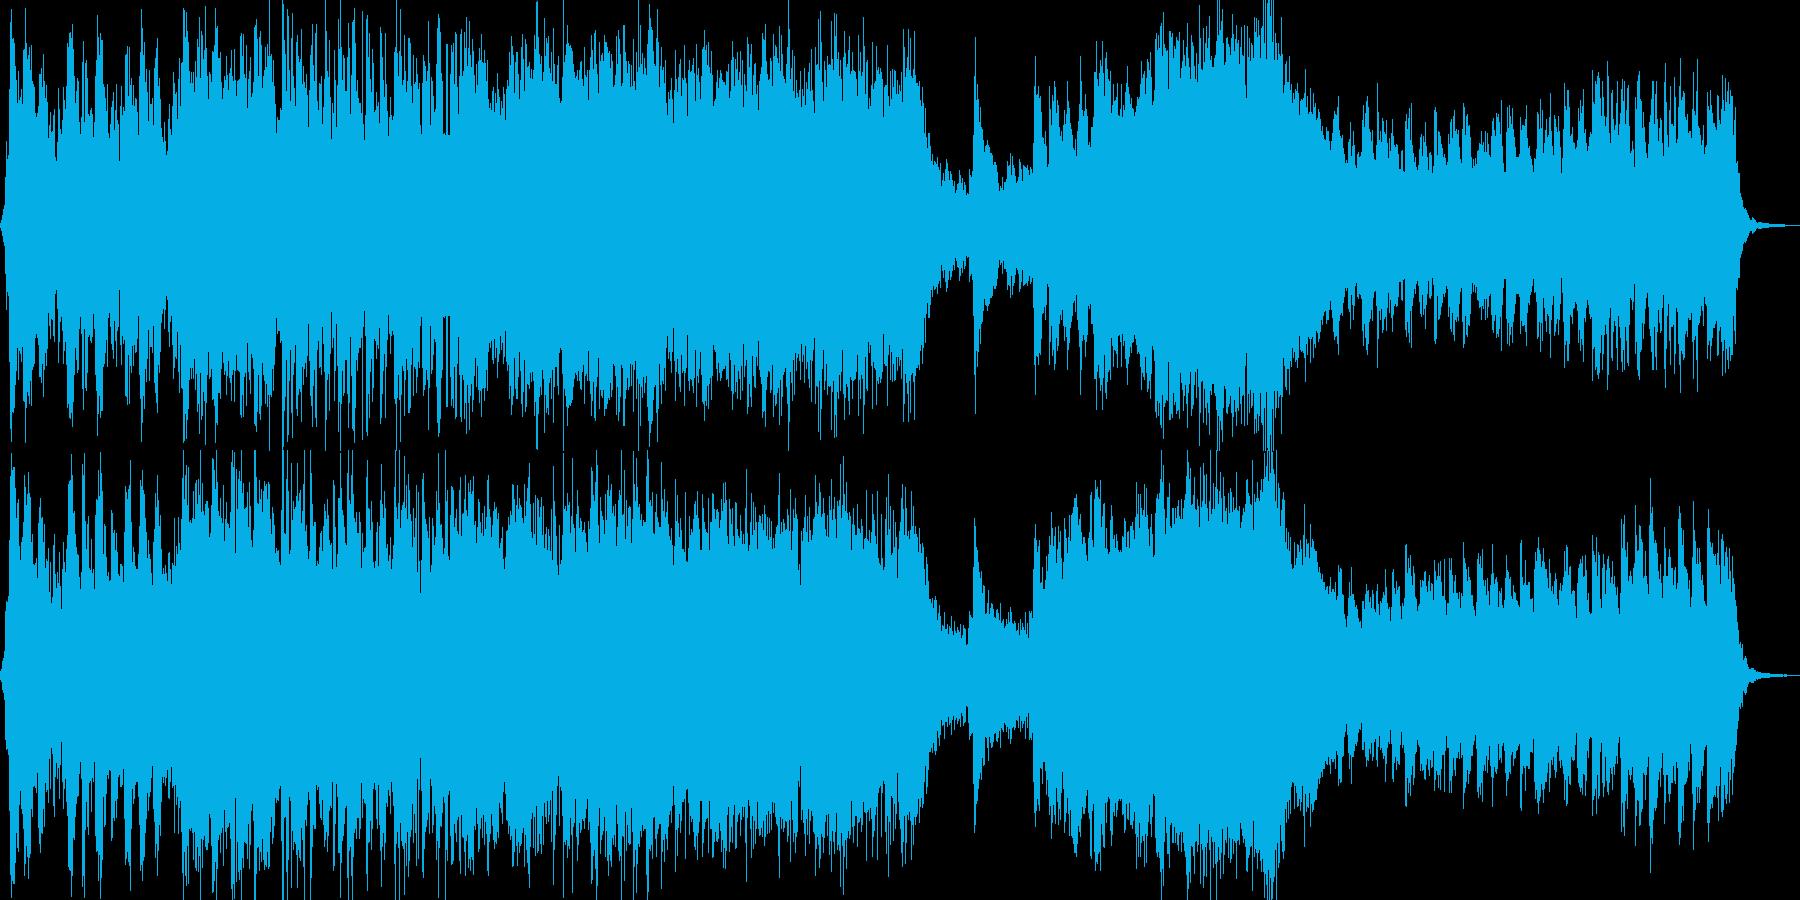 RPG世界の壮大なオーケストラ音楽の再生済みの波形